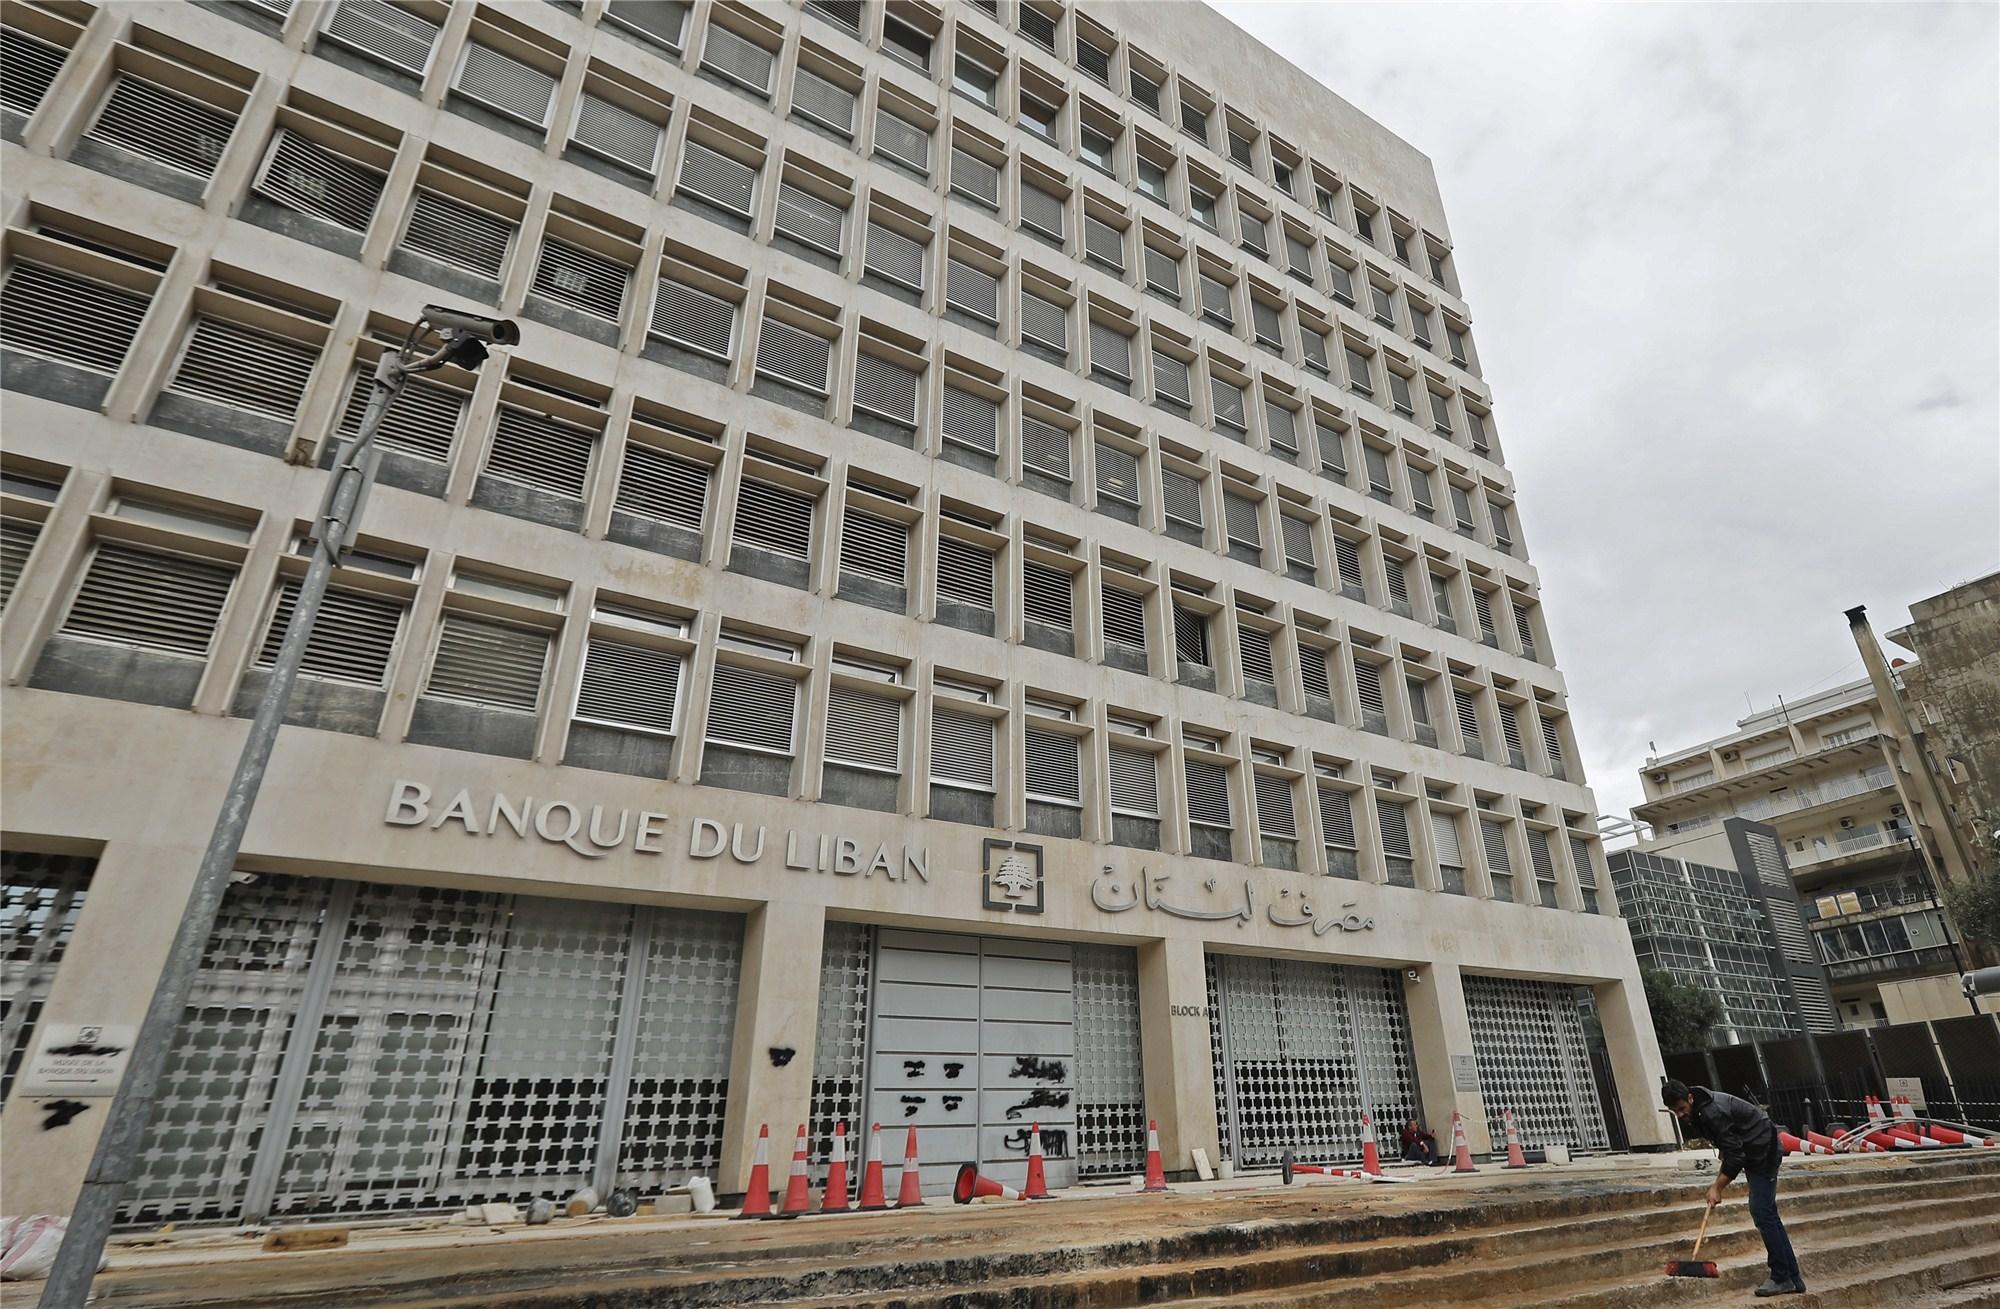 Heavy clashes erupt near Lebanon's central bank